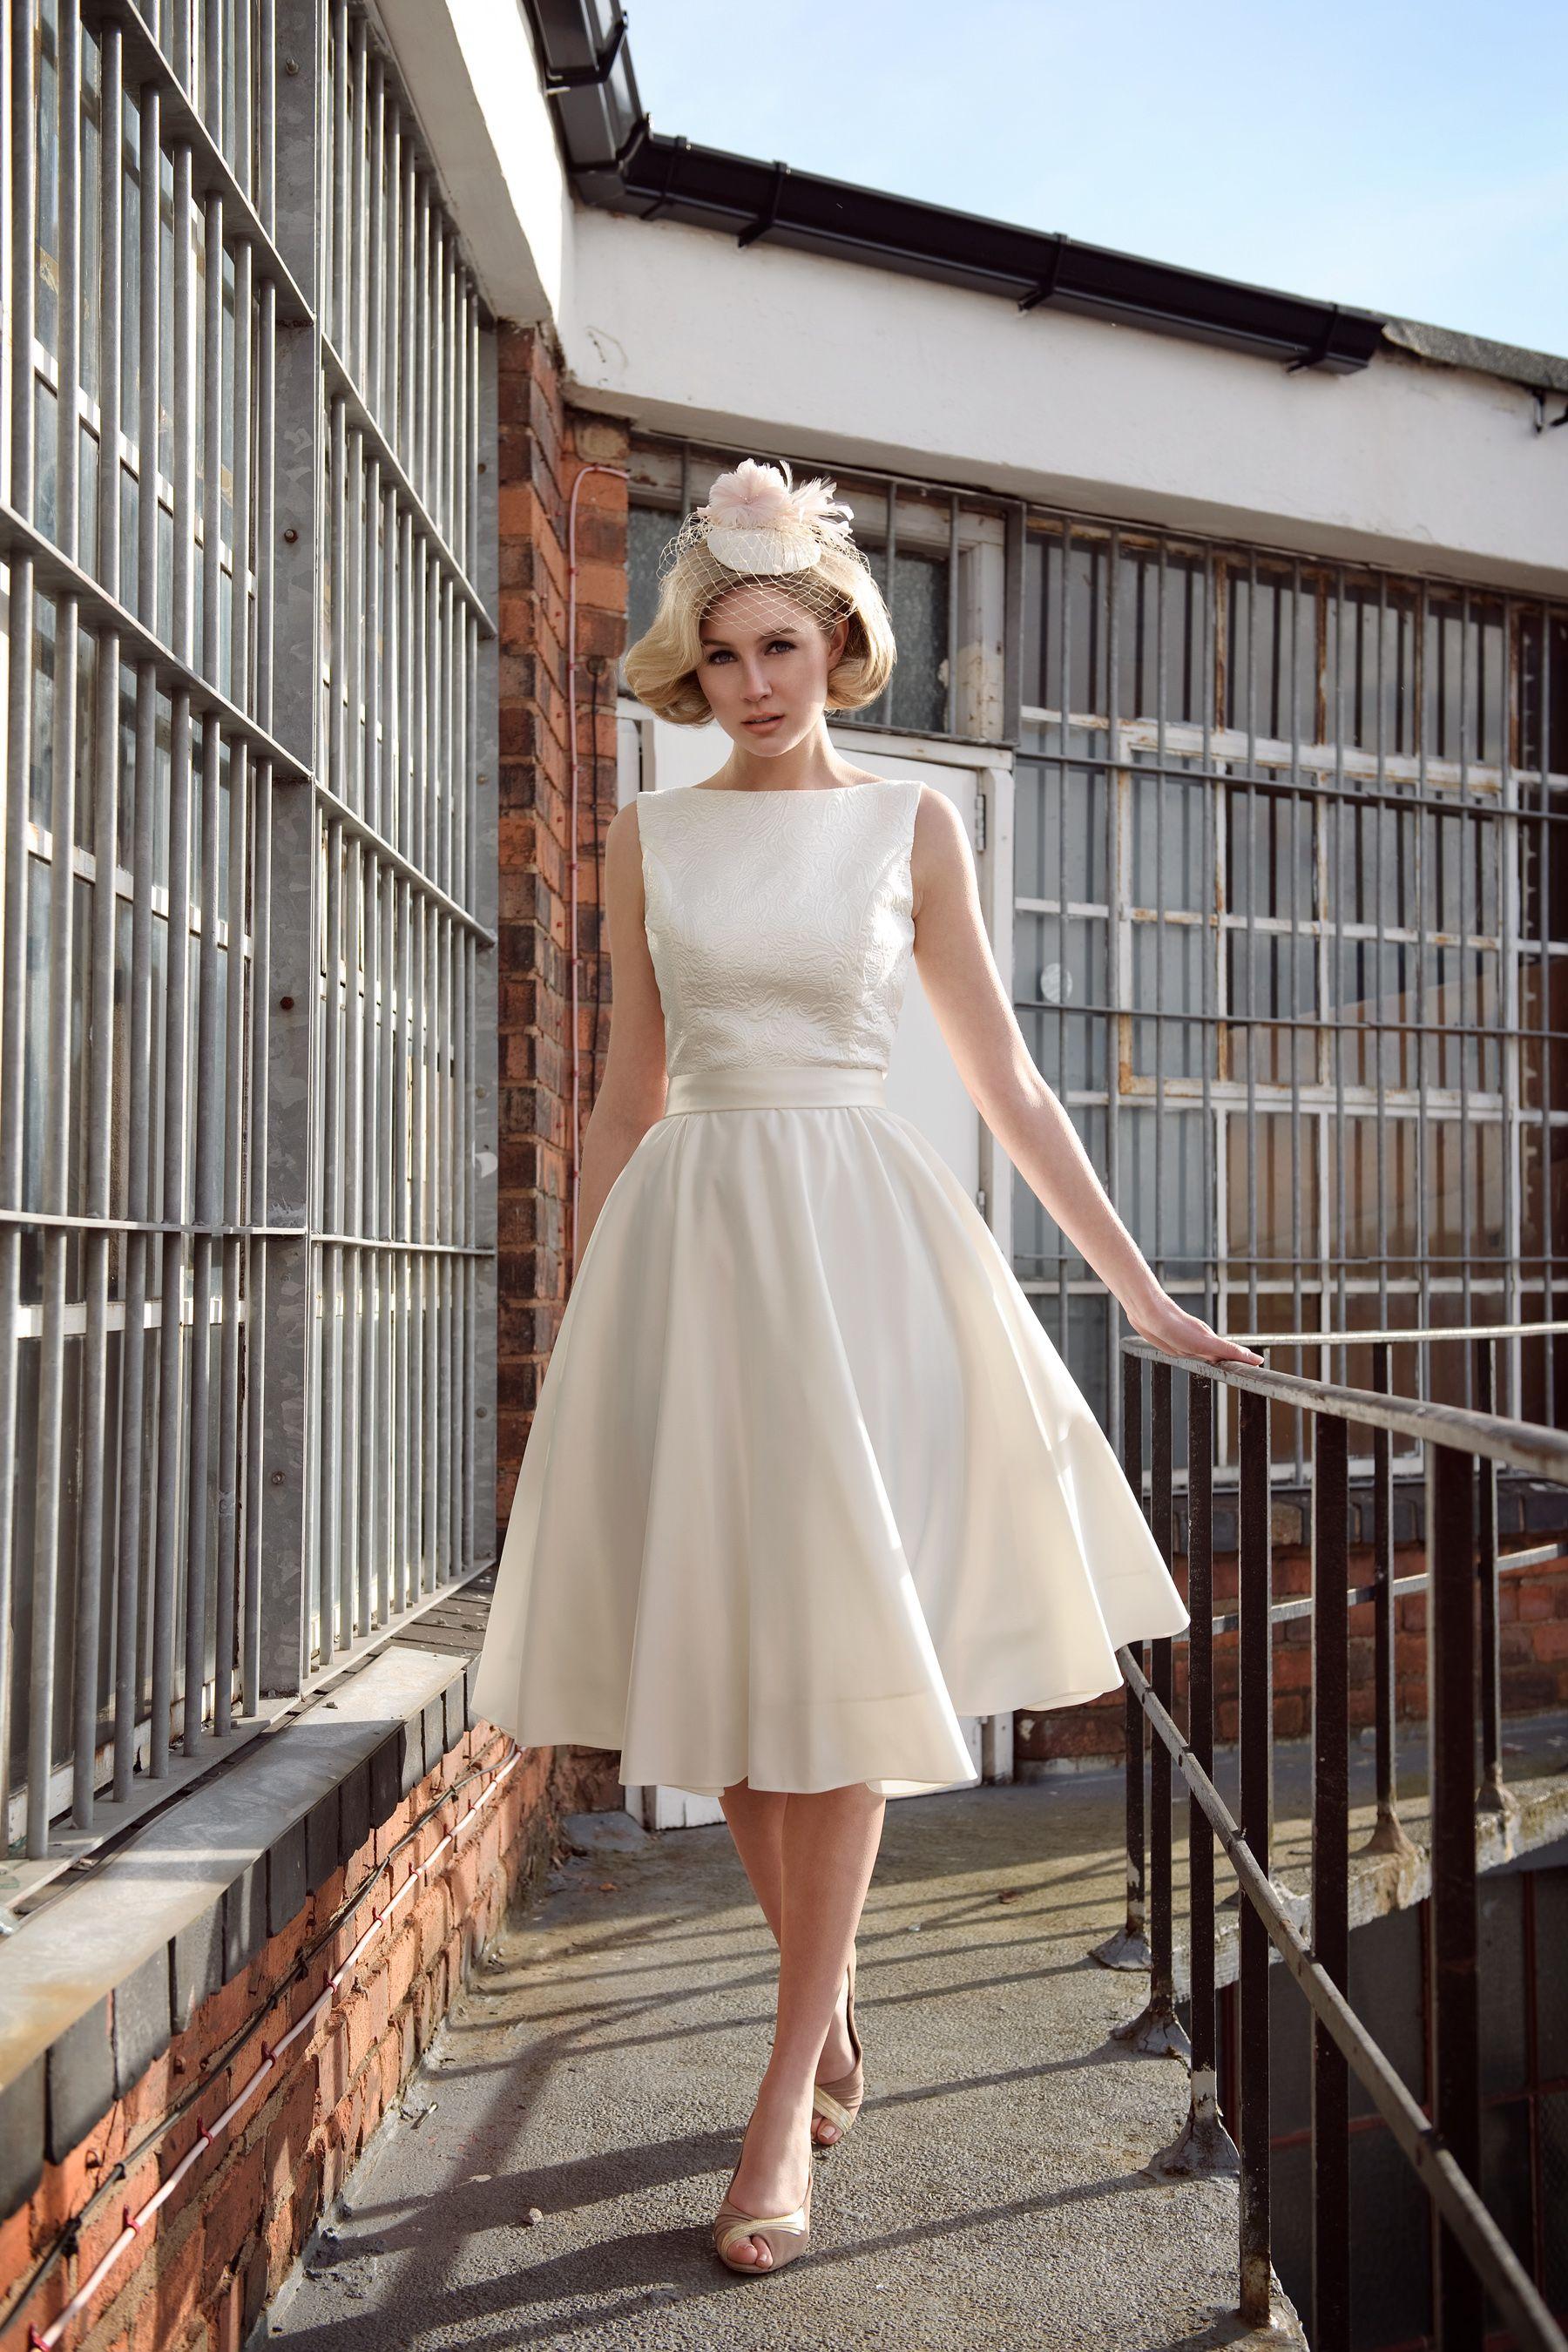 Short Wedding Dresses Tea Length Wedding Dresses Tobi Hannah Short Wedding Dress Boat Neck Wedding Dress Wedding Dress Inspiration [ 2700 x 1800 Pixel ]